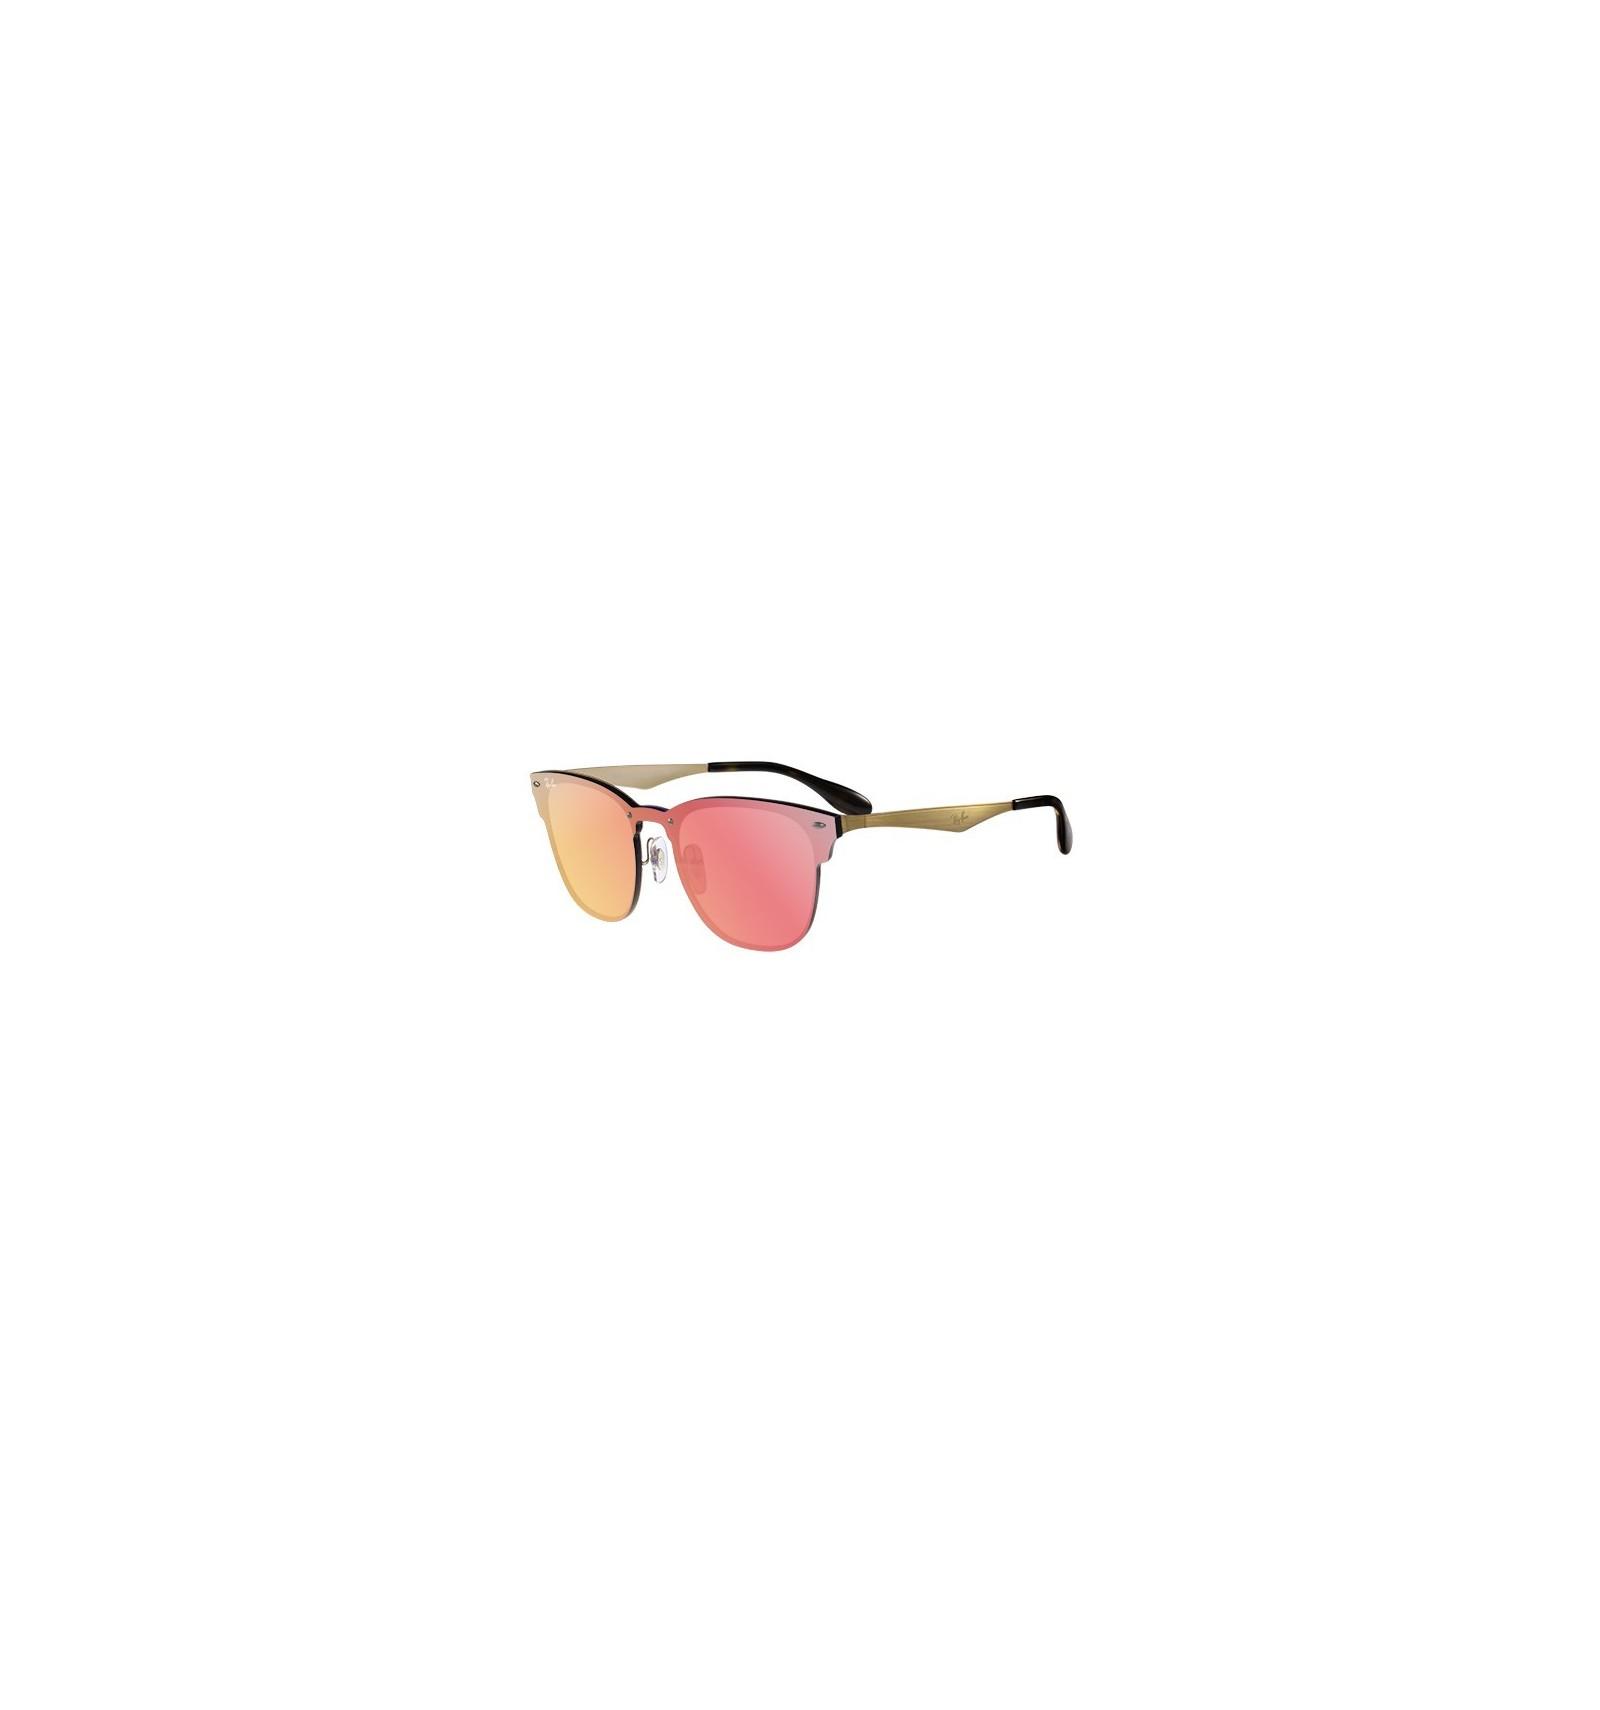 Ray Ban Blaze Pink Mirror   CINEMAS 93 b6832b4a38